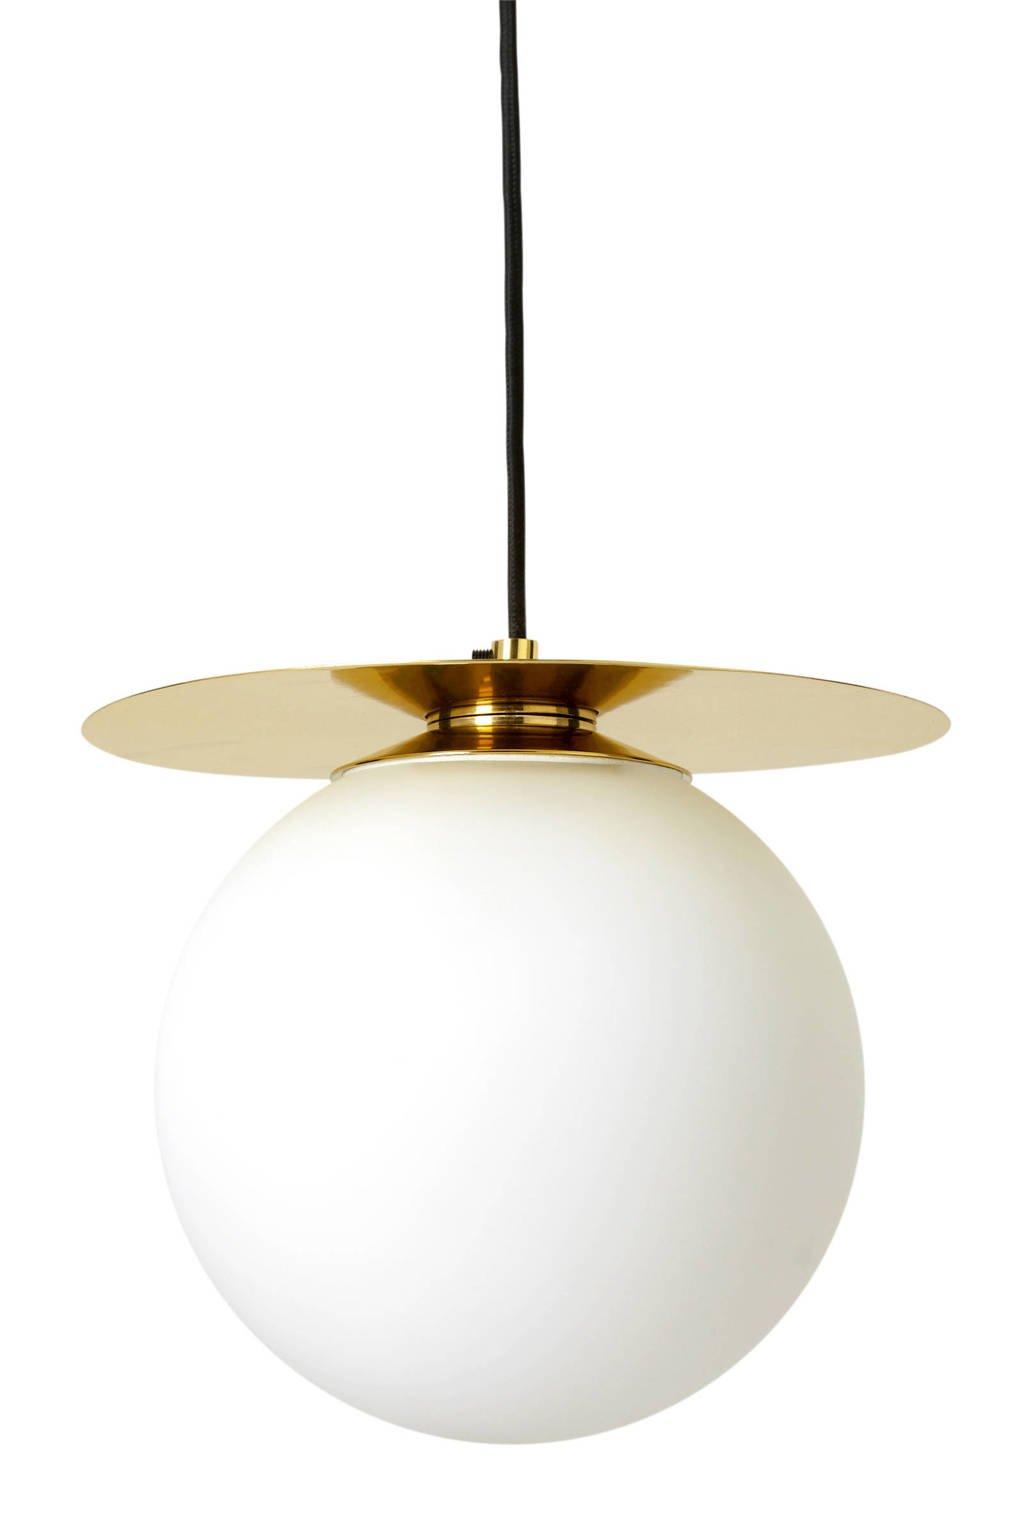 whkmp's own hanglamp, Goud